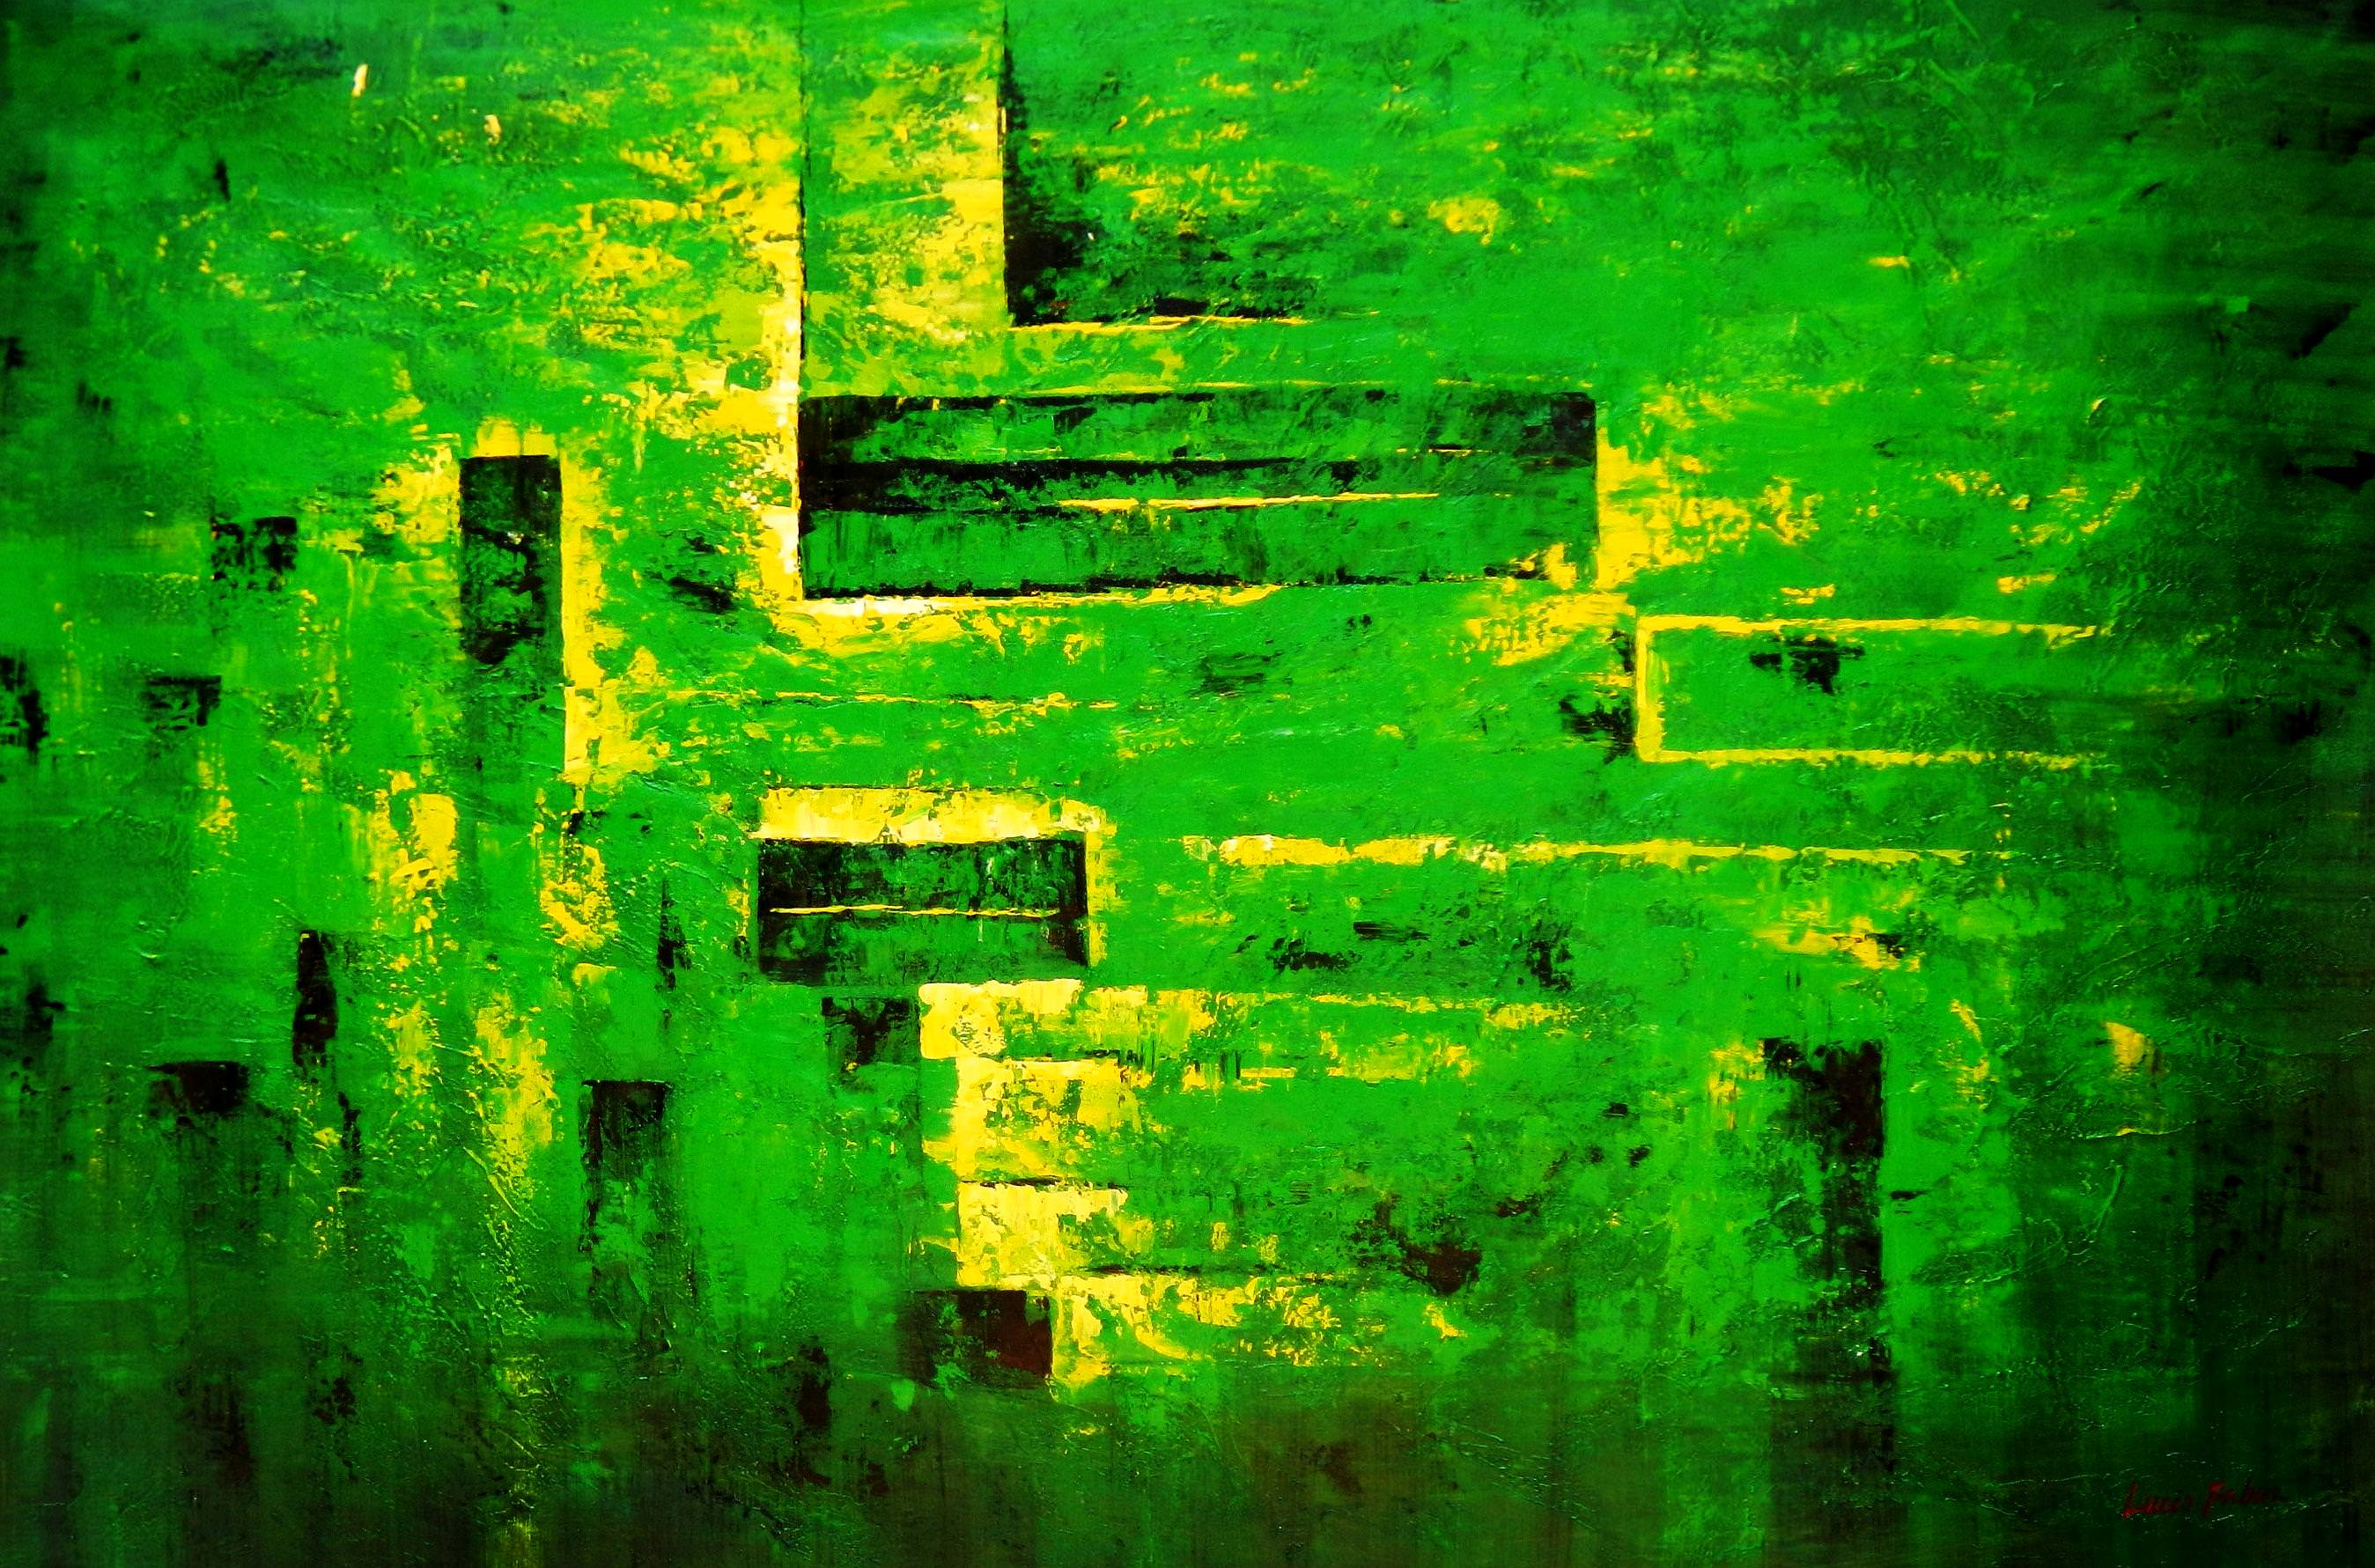 Abstrakt - Berlin Tiergarten p93830 120x180cm abstraktes Ölbild handgemalt